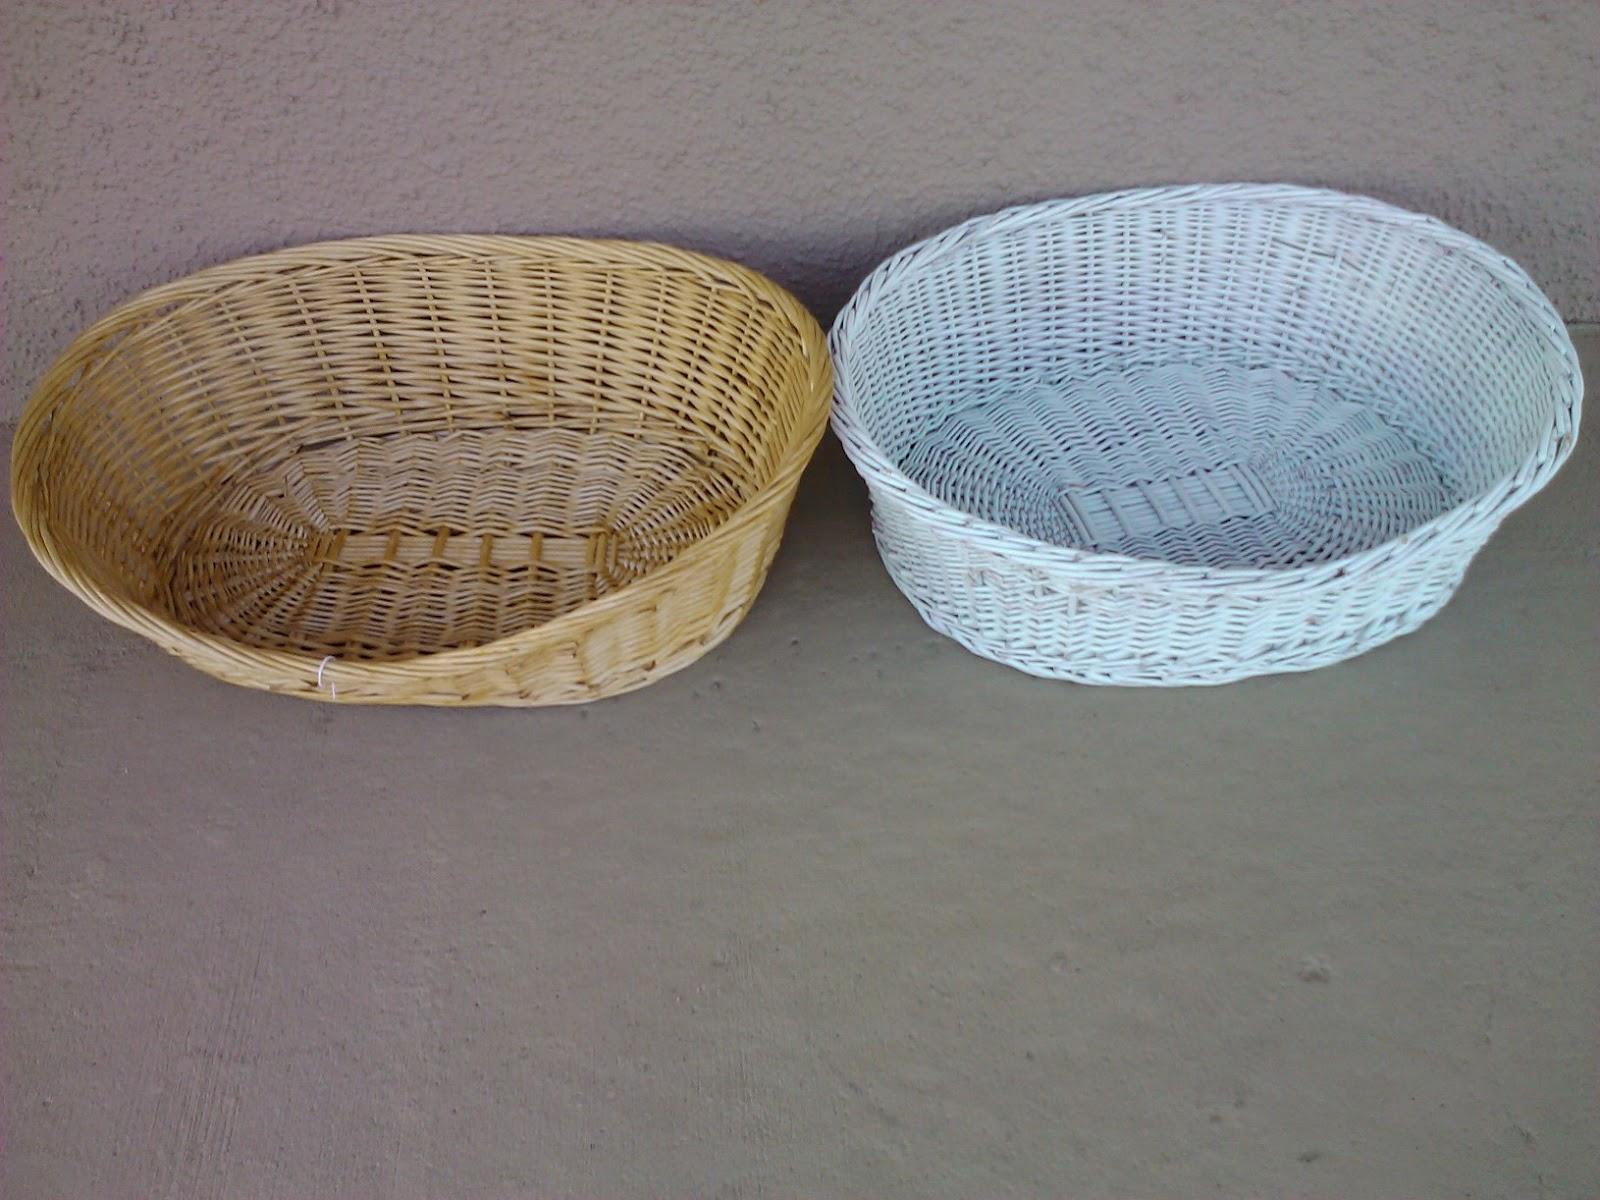 Woven Basket Procedure : Petstuffresale spot items under at pet